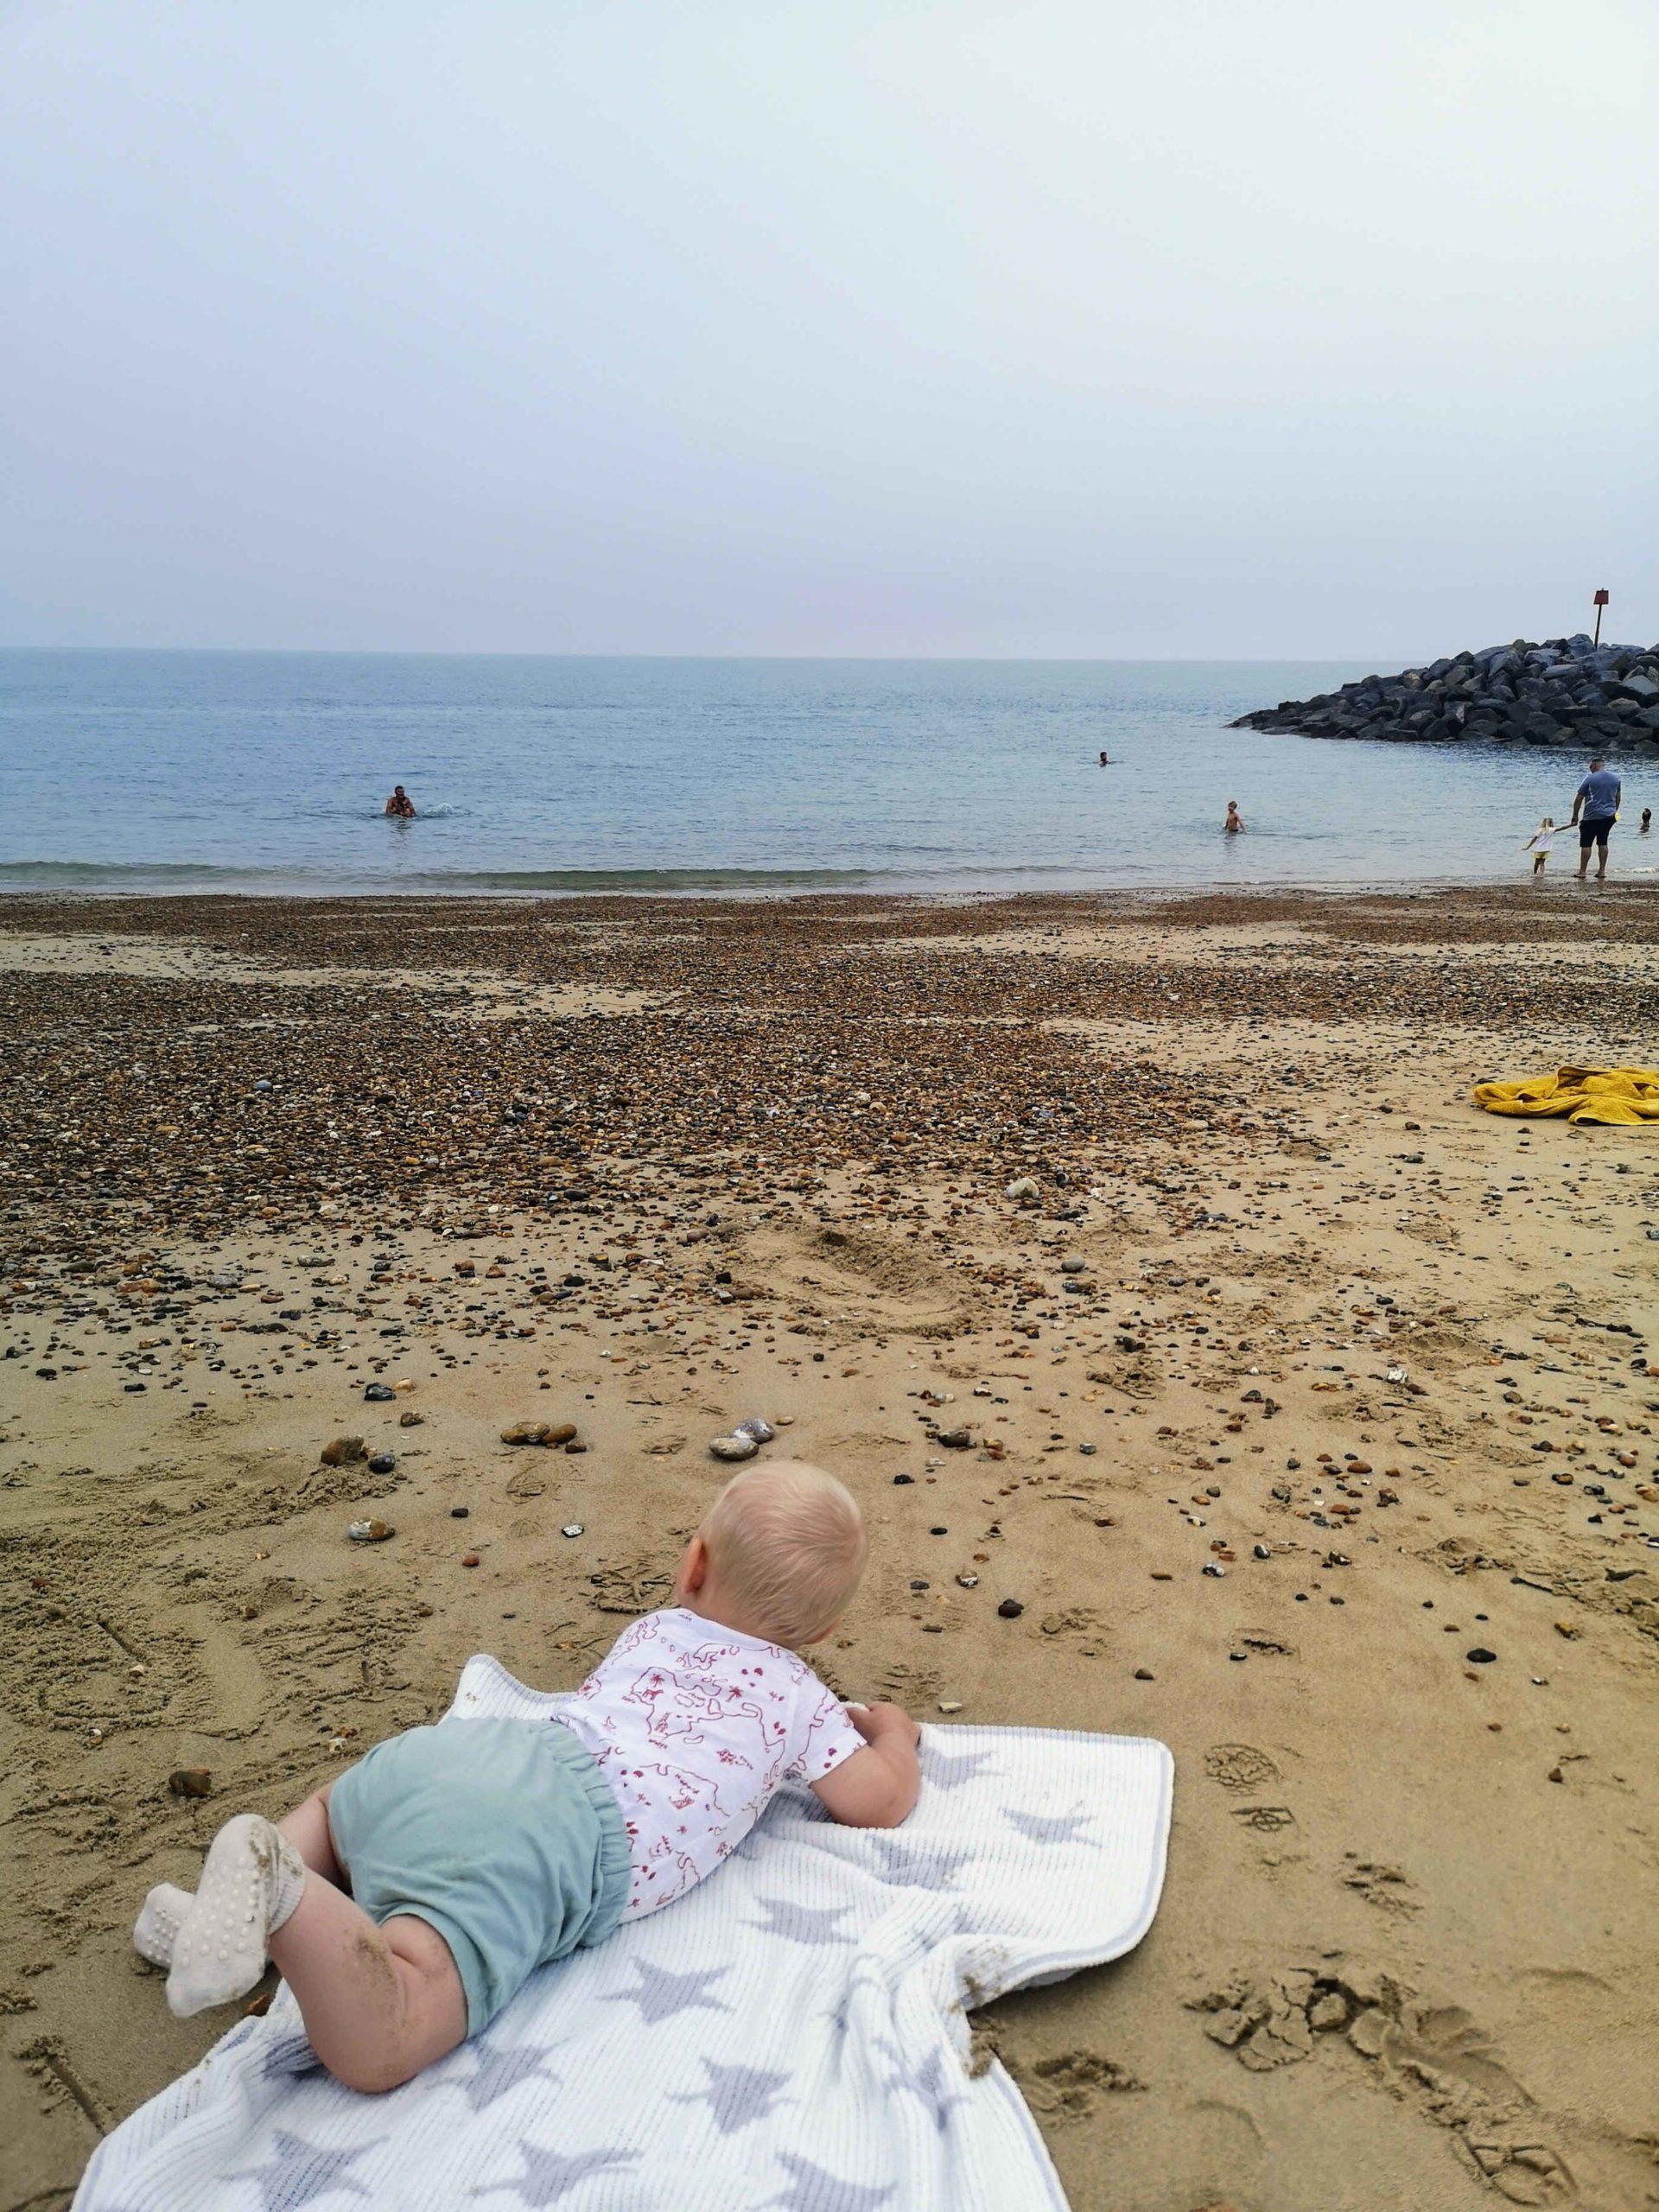 At Mermaid Beach